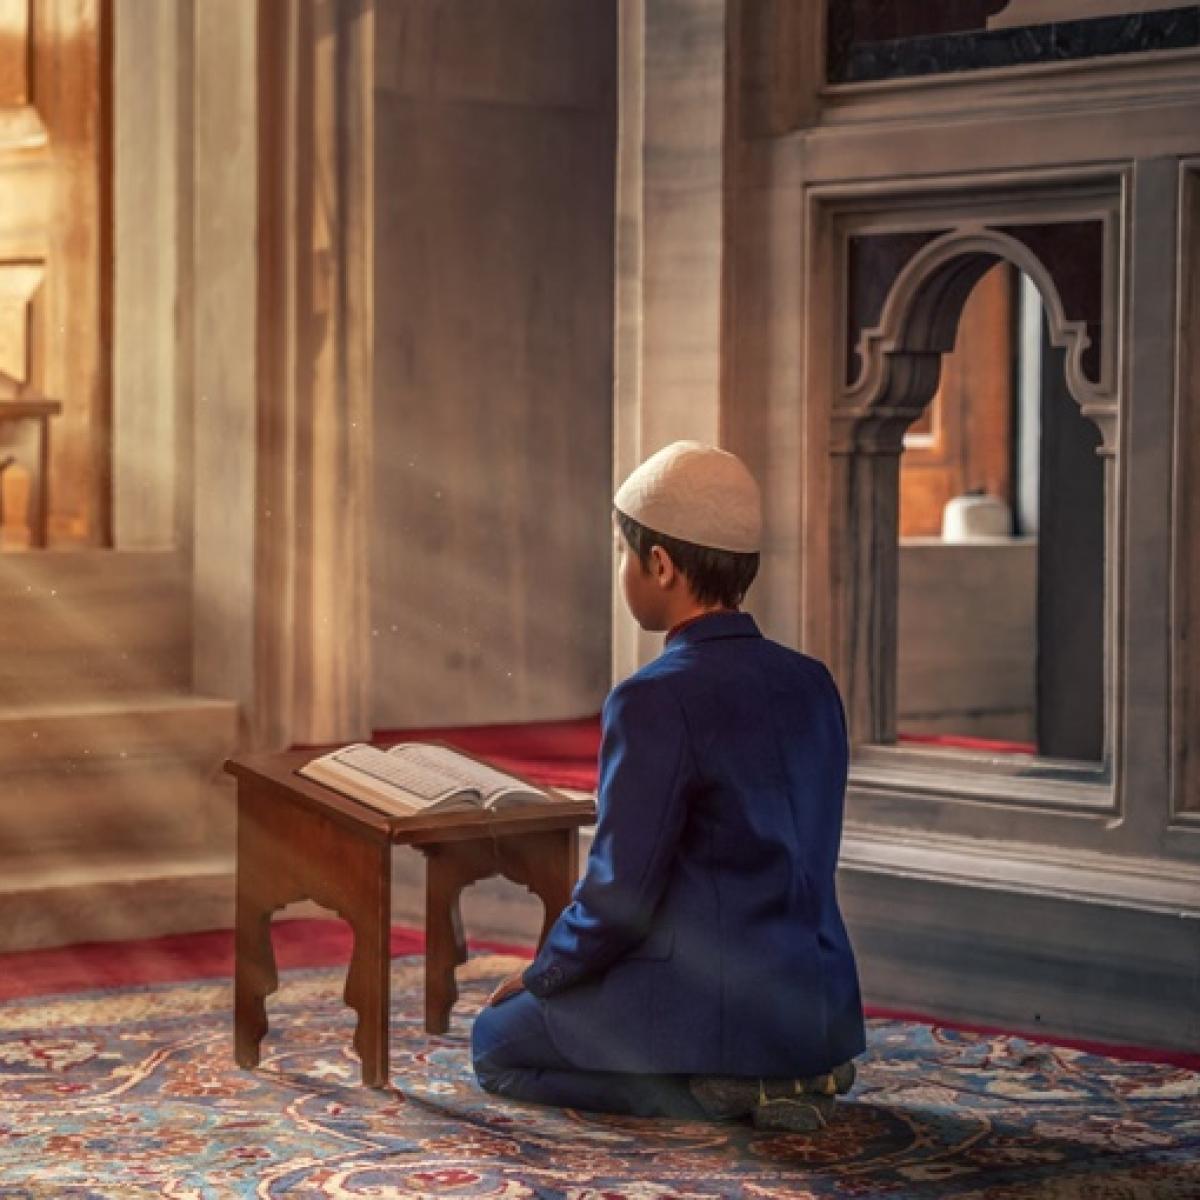 Ramadan or Ramzan - which is the correct term?